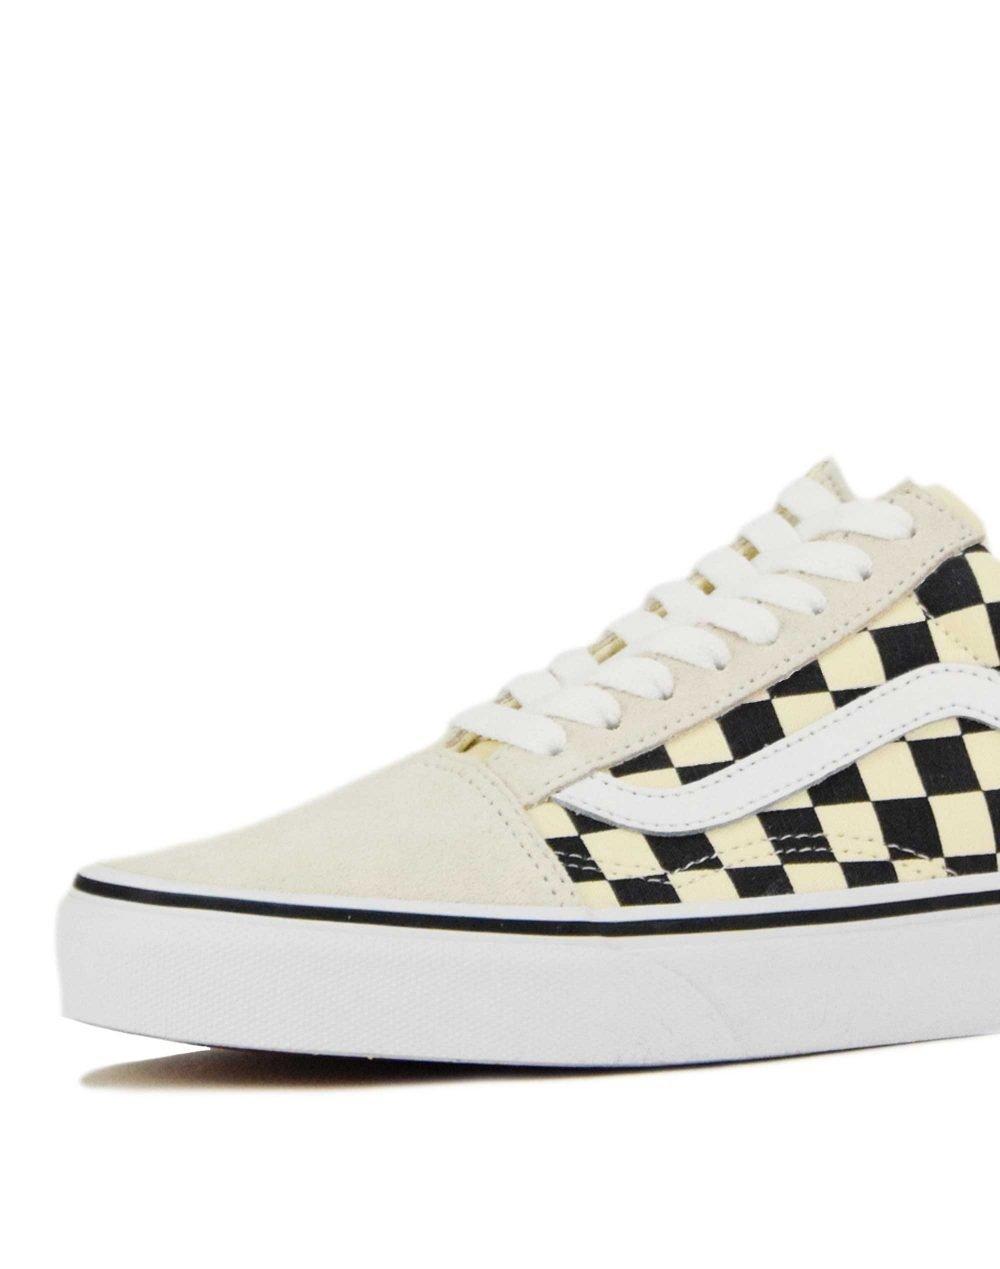 Vans Old Skool Checkerboard (VN0A38G127K1) White/Black